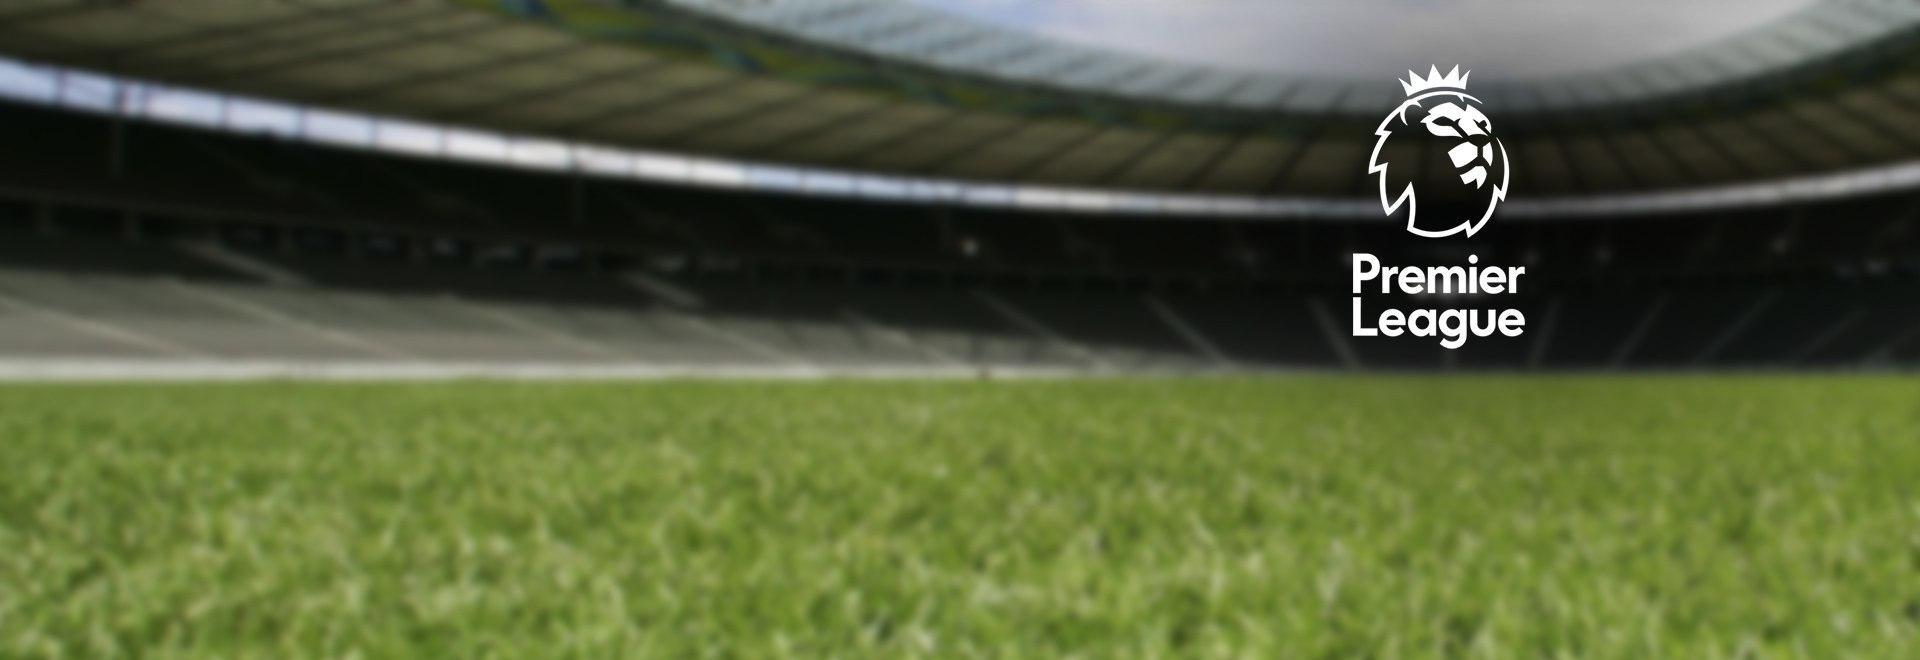 Arsenal - West Ham United. 2a g.